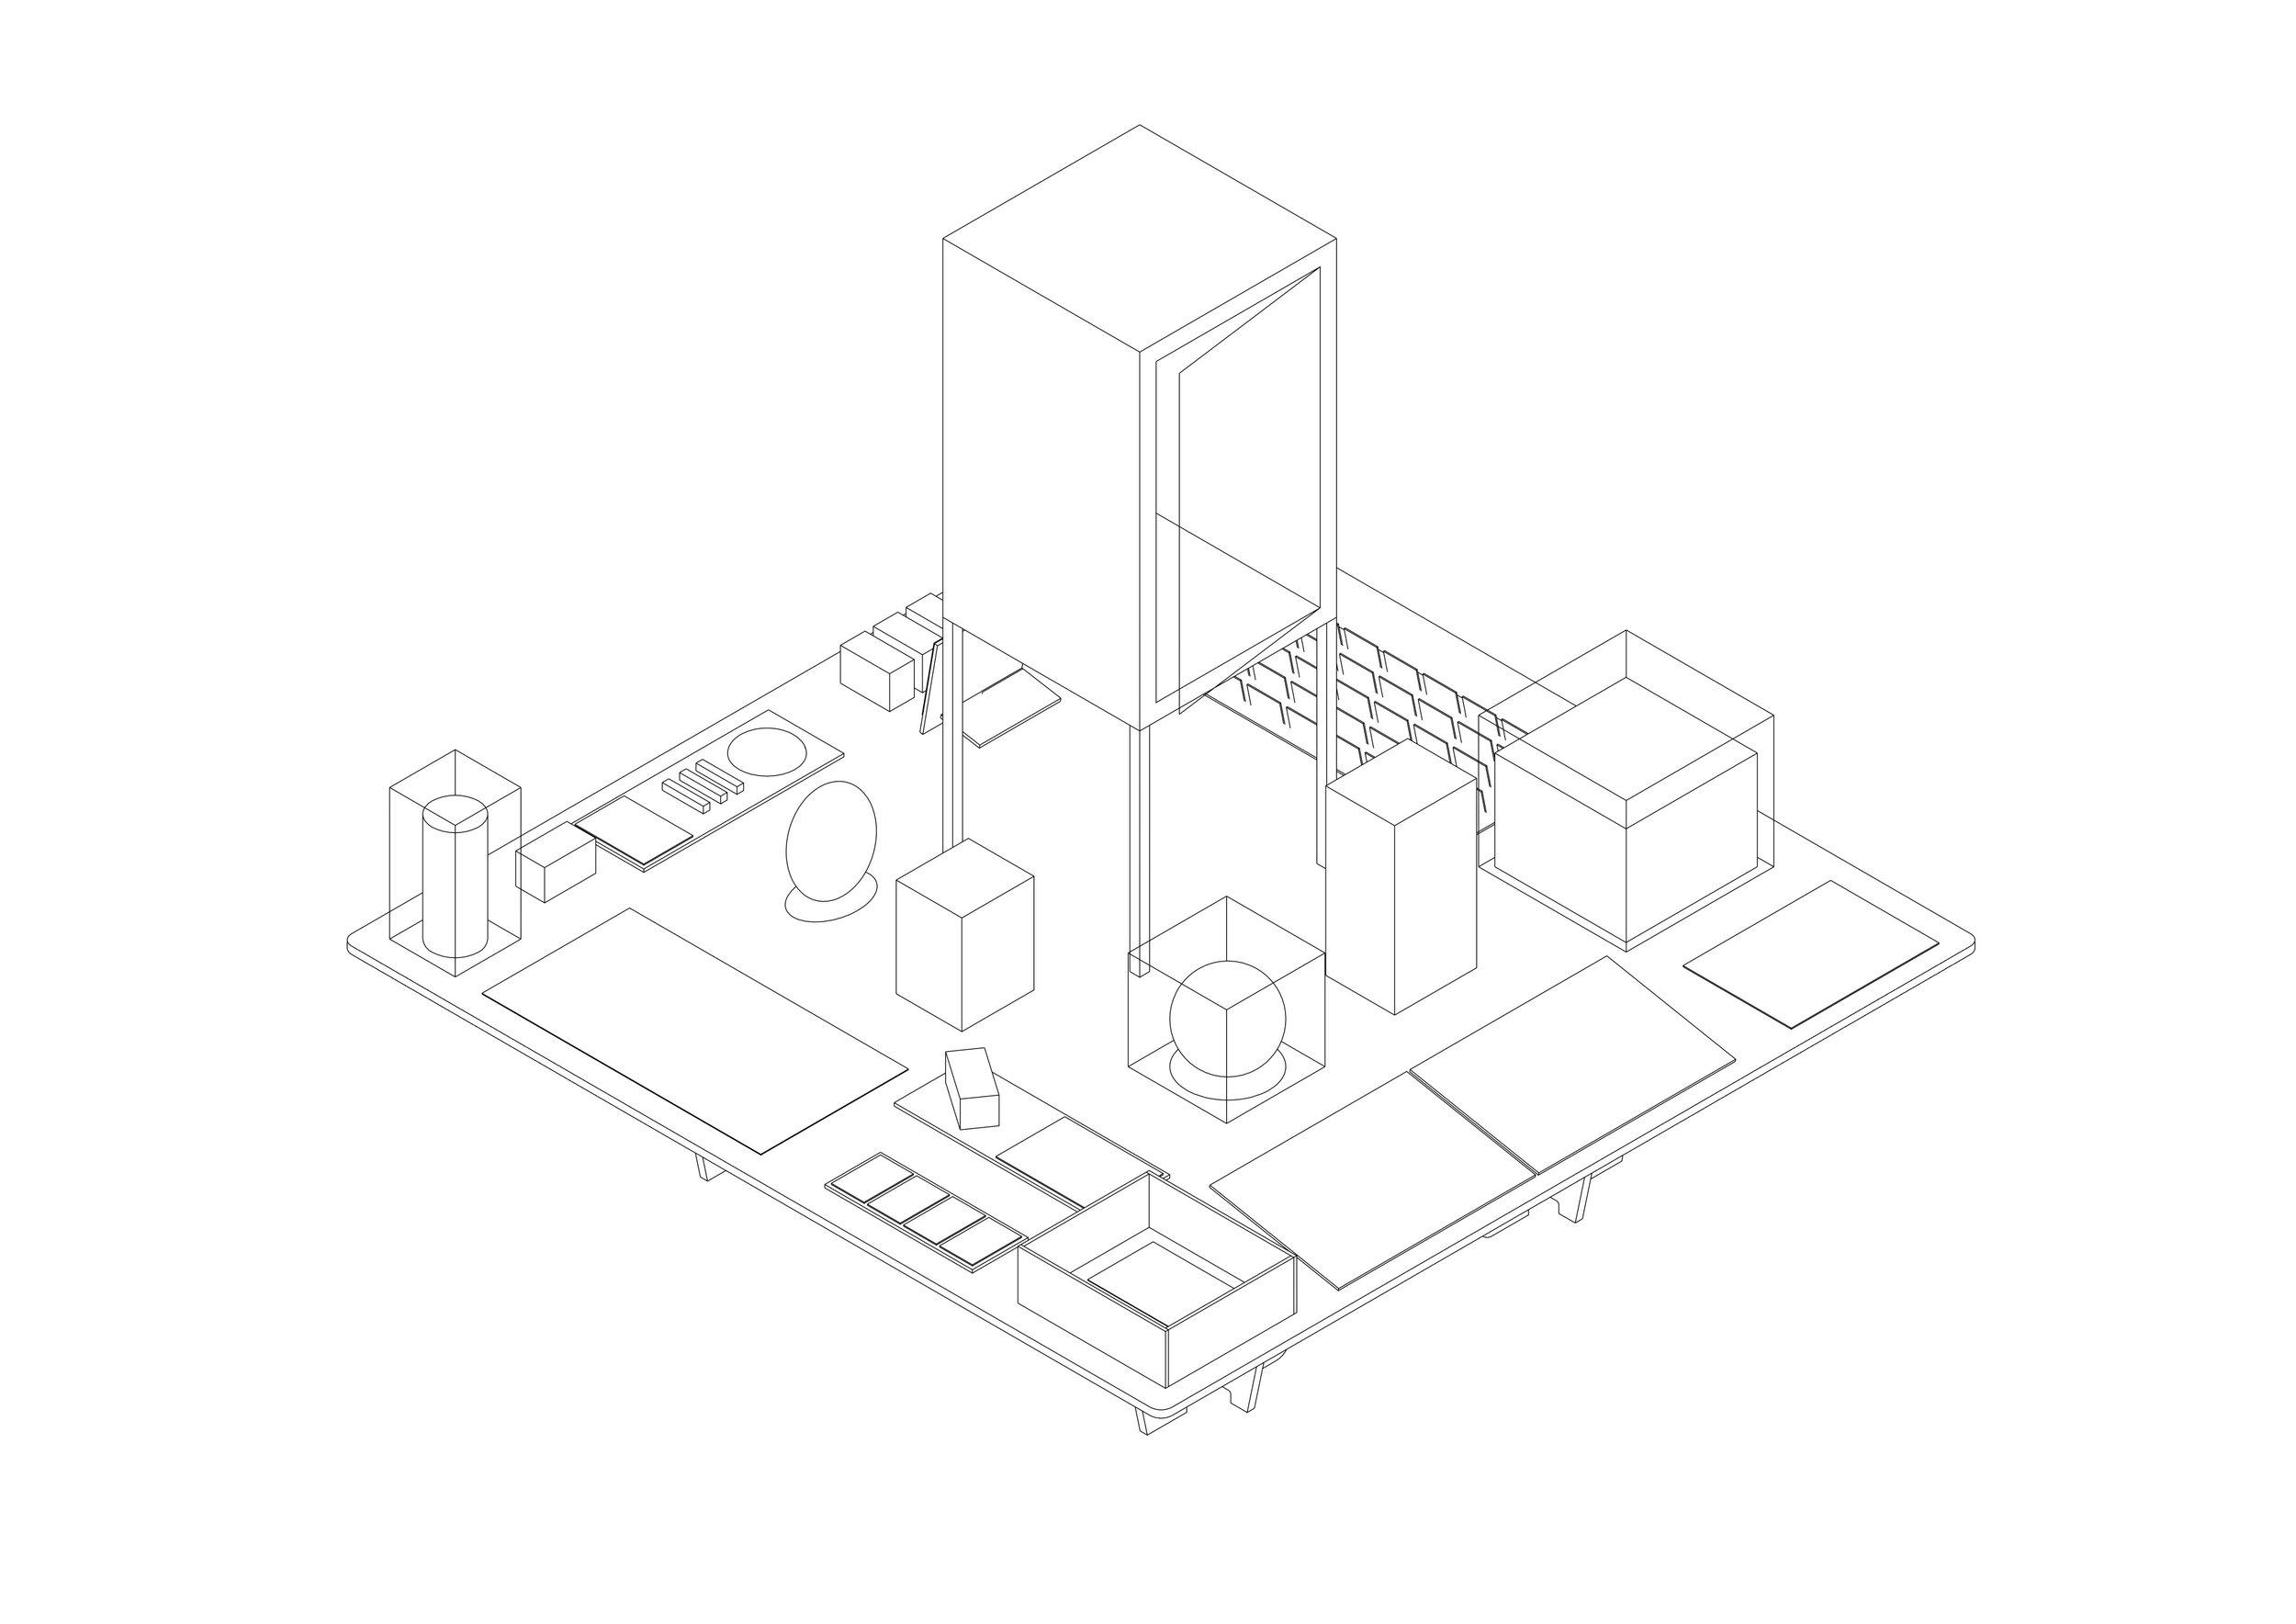 Knowledge Pearl Table - Axonometric